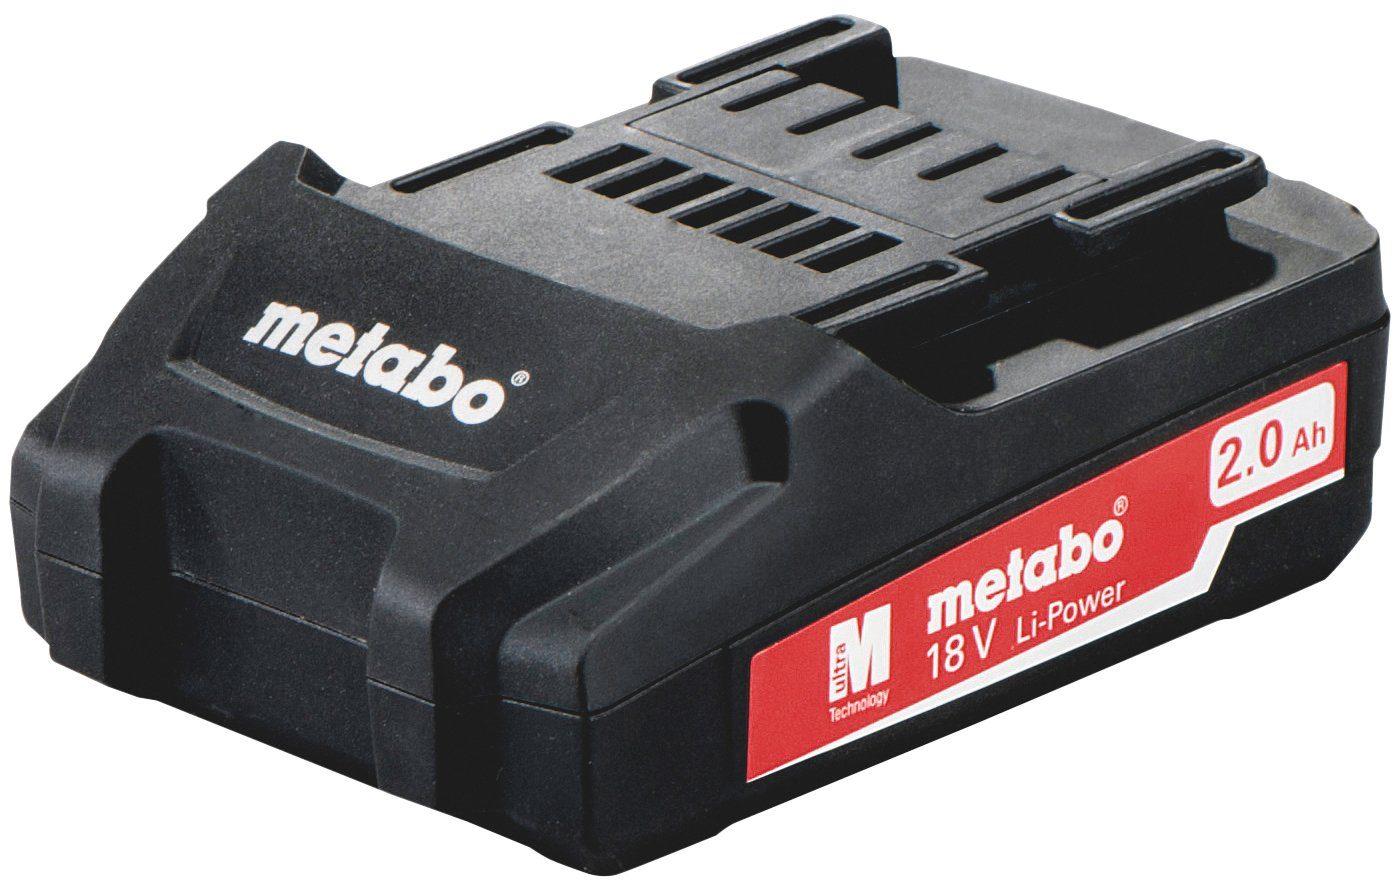 METABO Akku »18 V, 2,0 Ah, Li-Power Pick + Mix Serie«, 18 V, 2 Ah